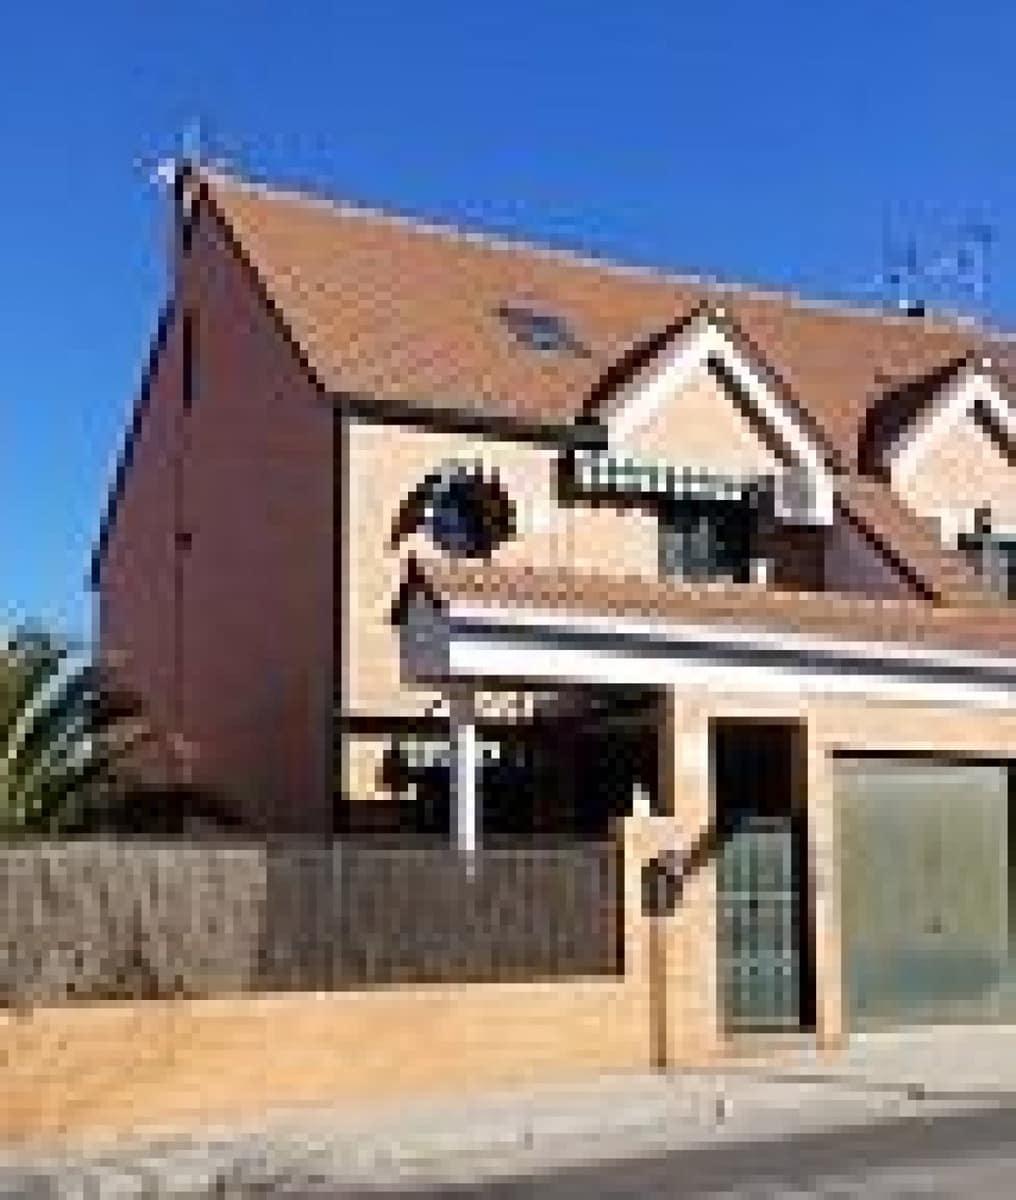 4 sovrum Radhus till salu i Mostoles med pool garage - 330 600 € (Ref: 5260242)